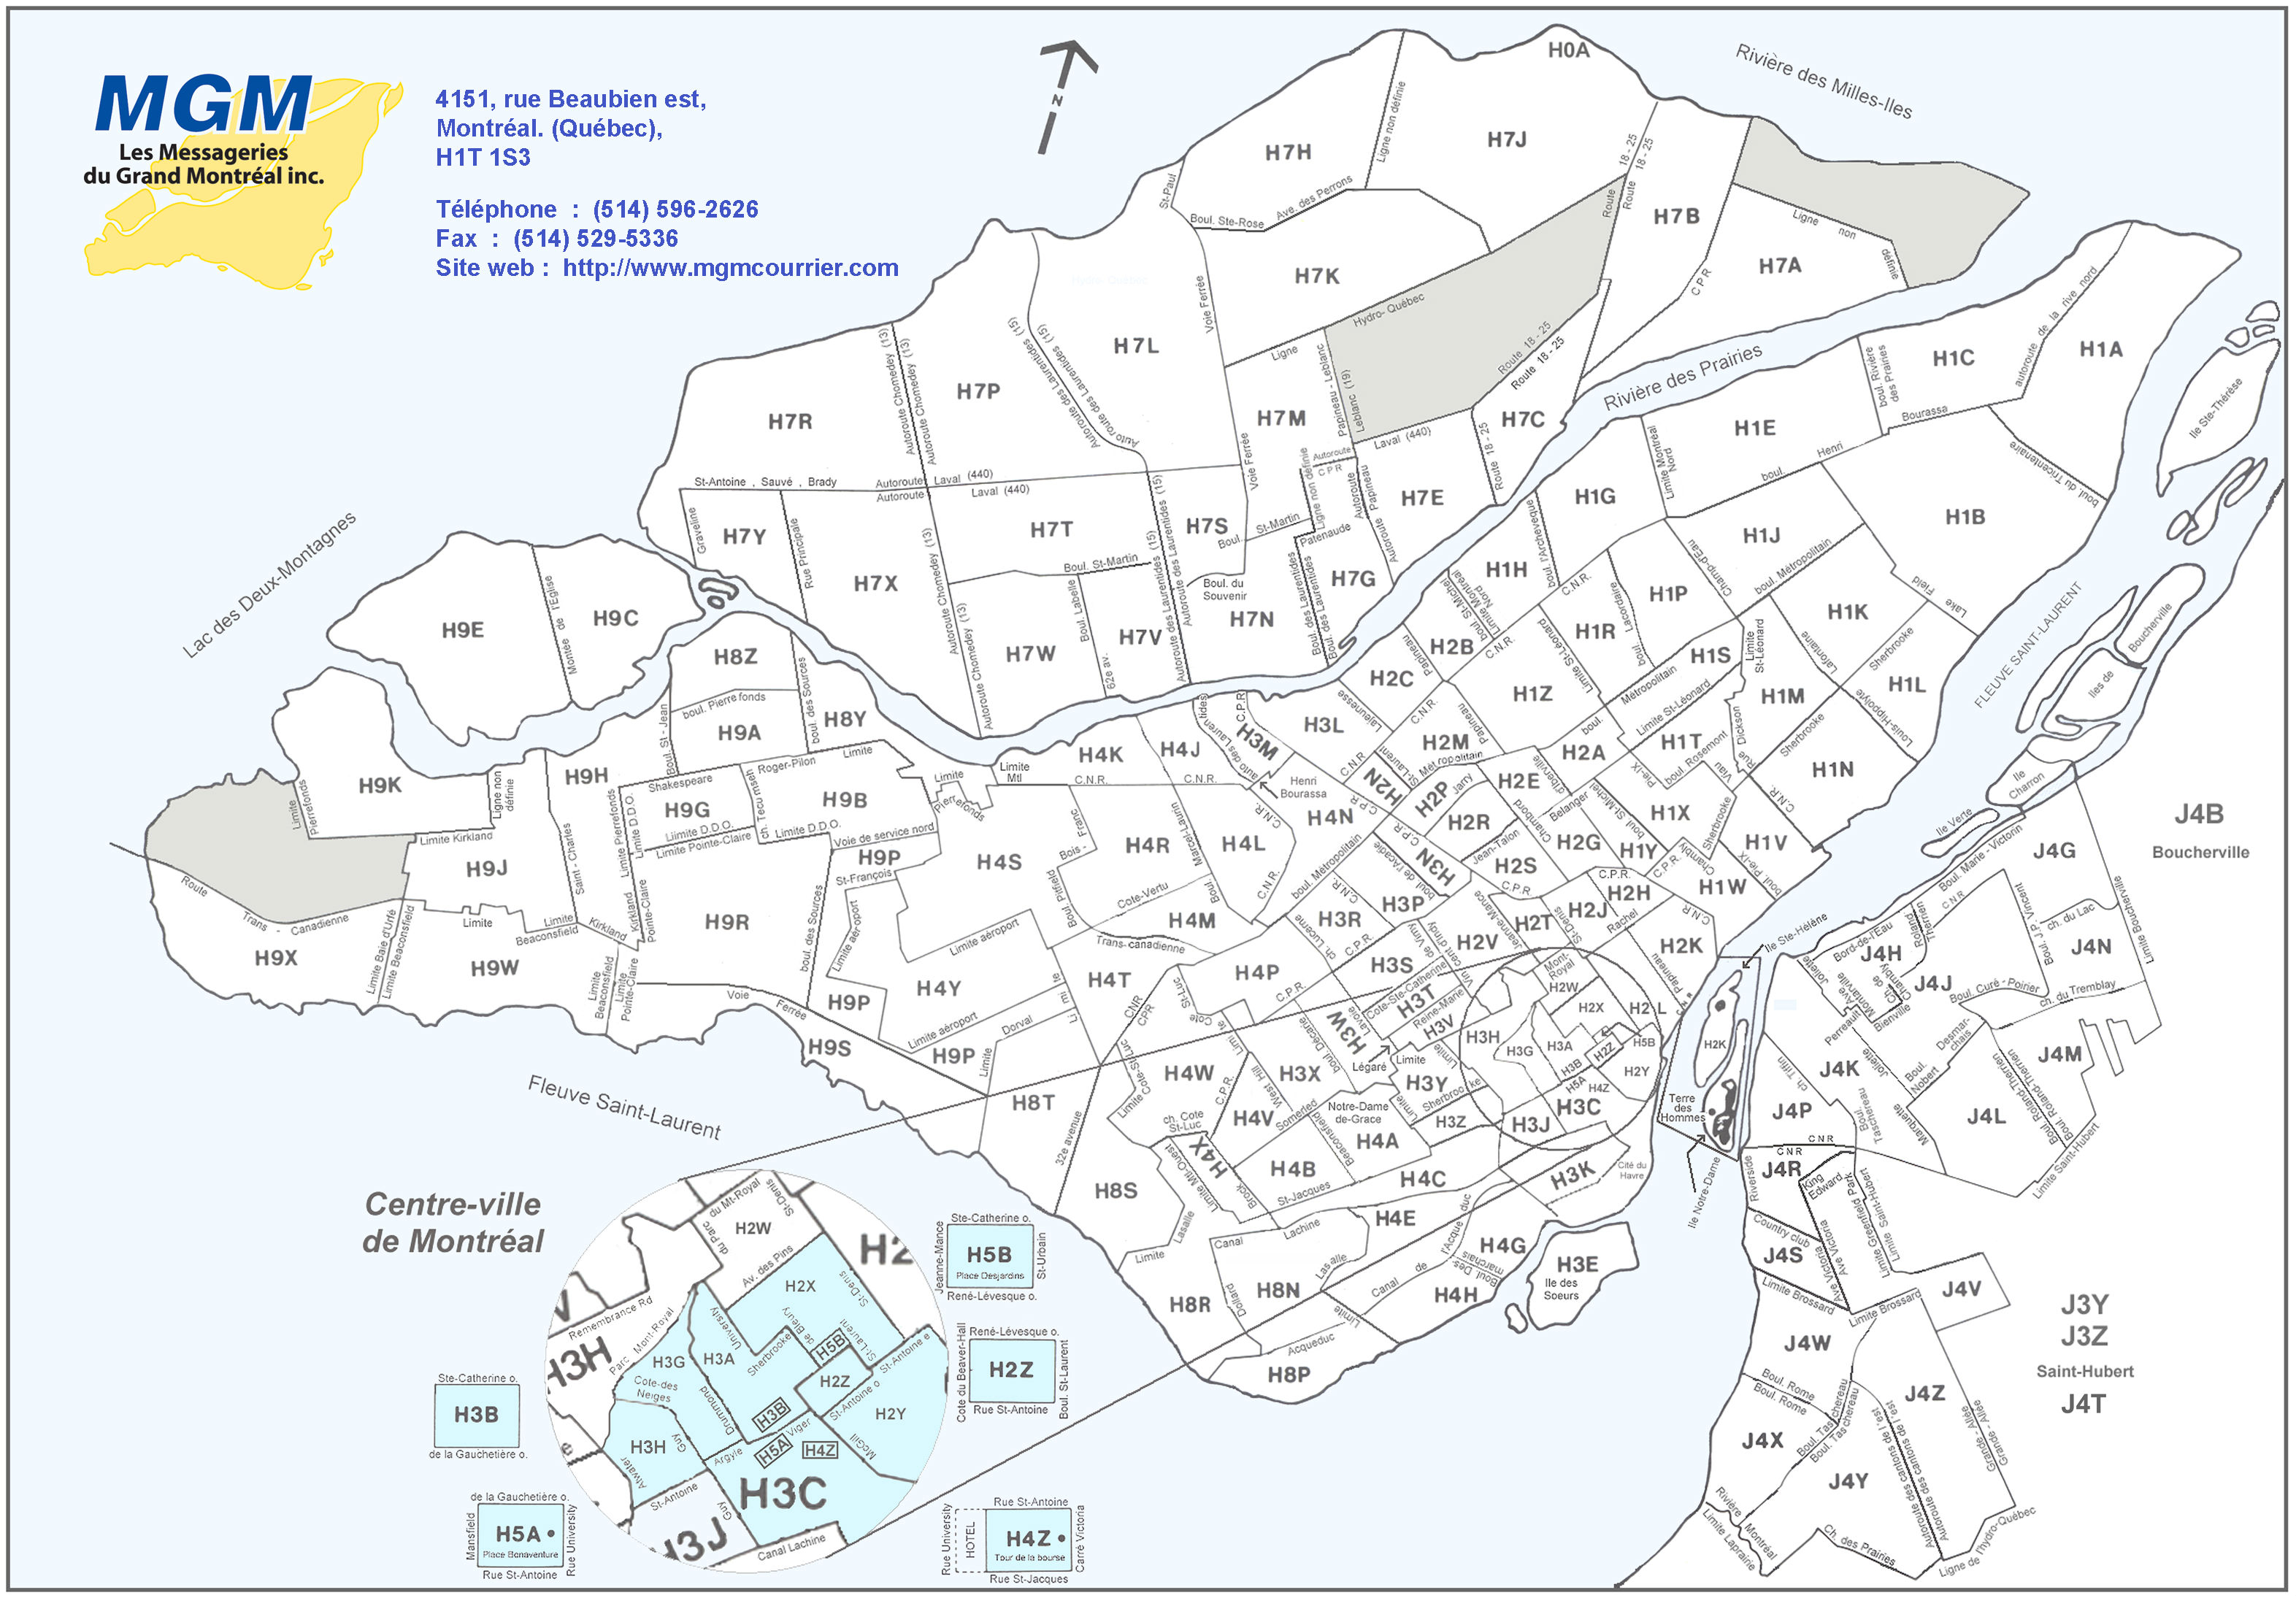 img/carte-geographique-mgm.jpg